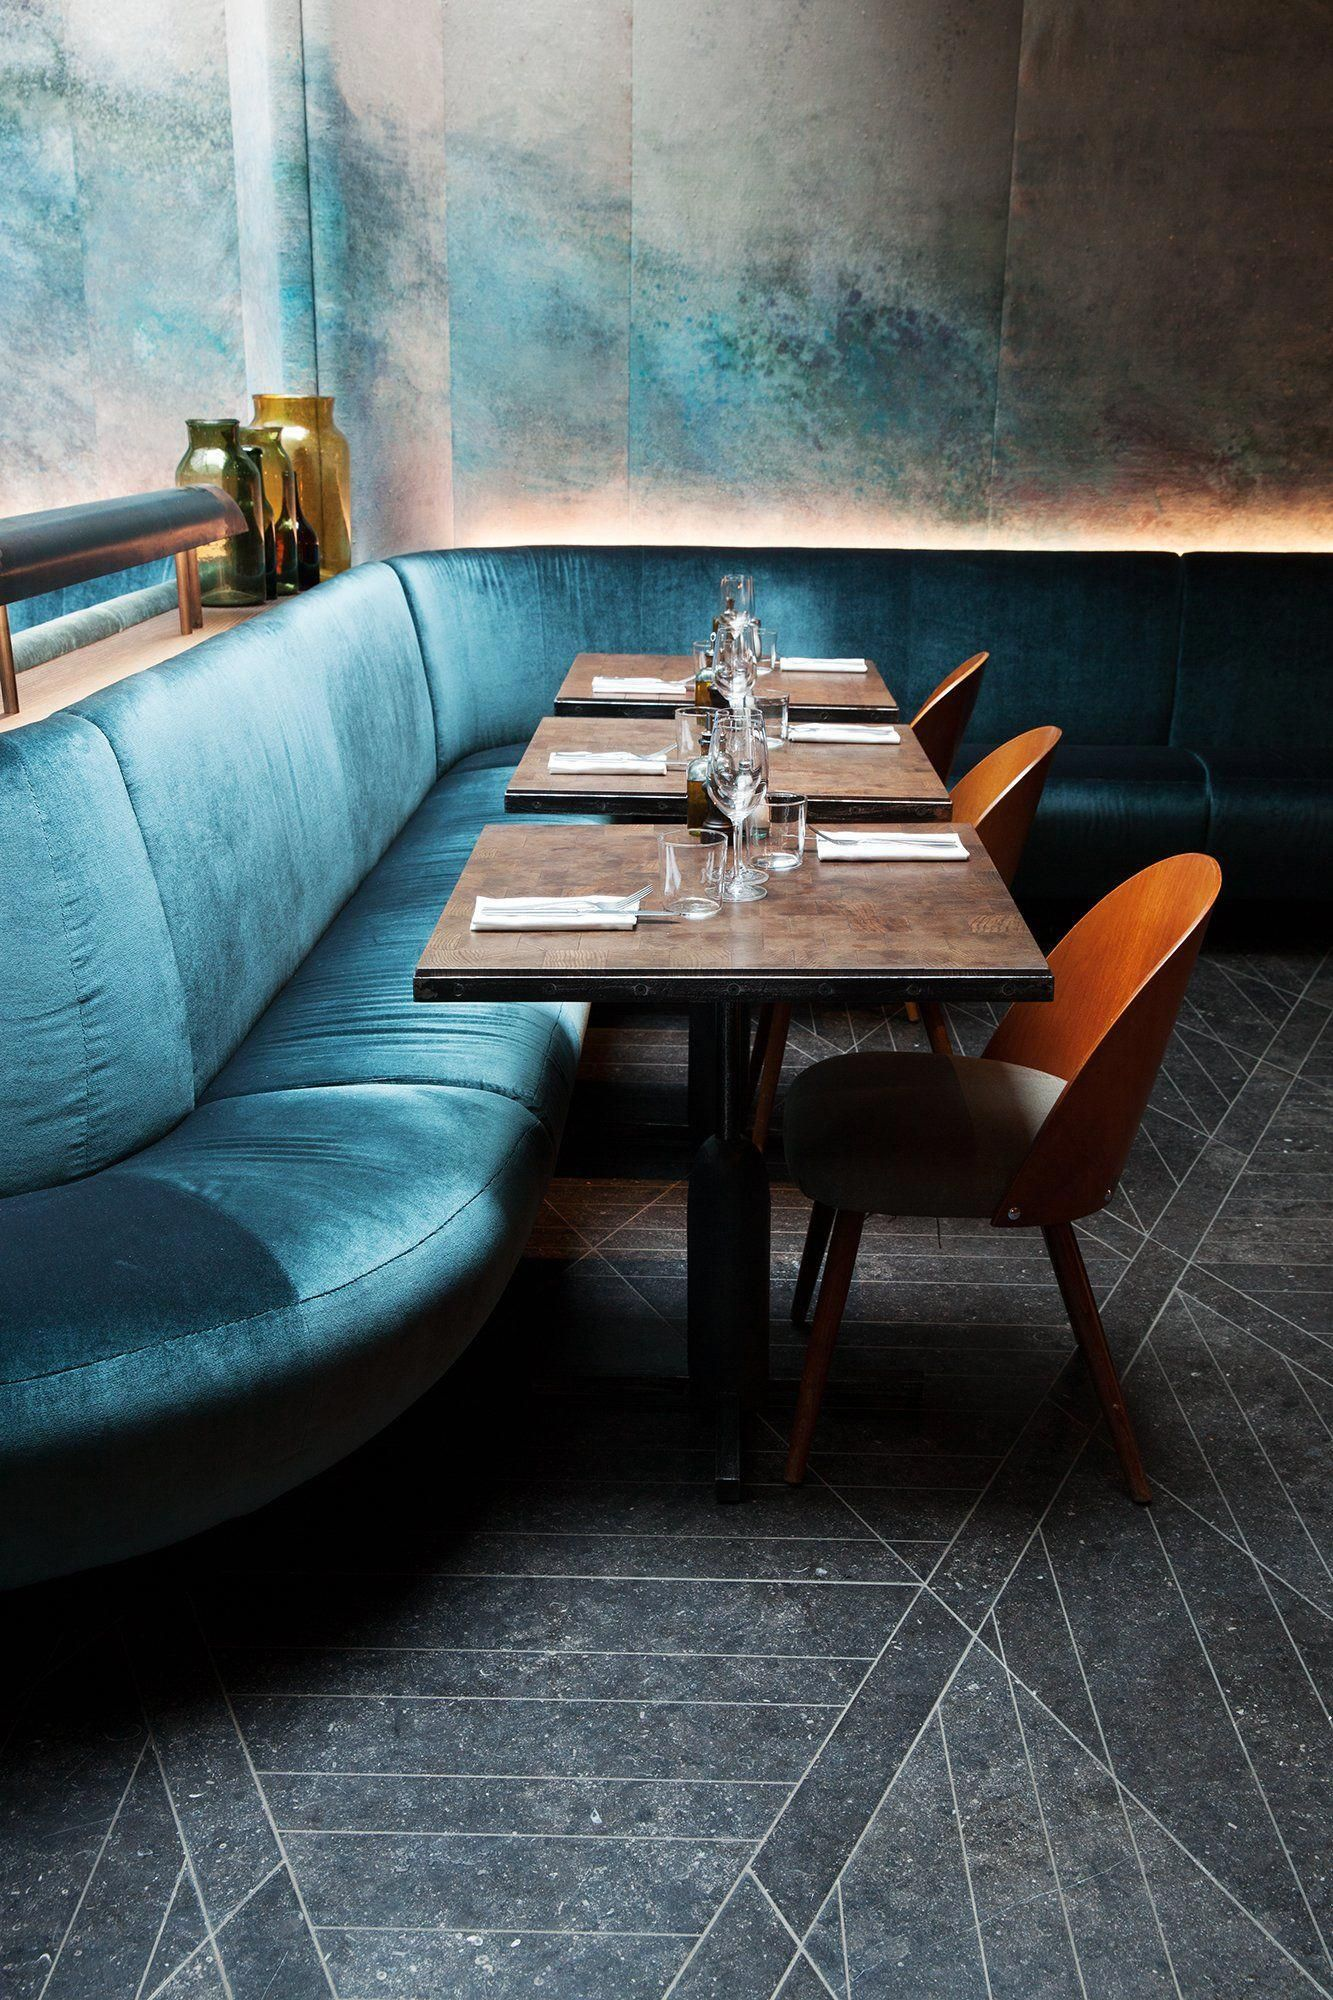 Salle Restaurant Bar Hôtel National Des Arts Et Métiers Paris  #u201dbarfurnitureideasu201d